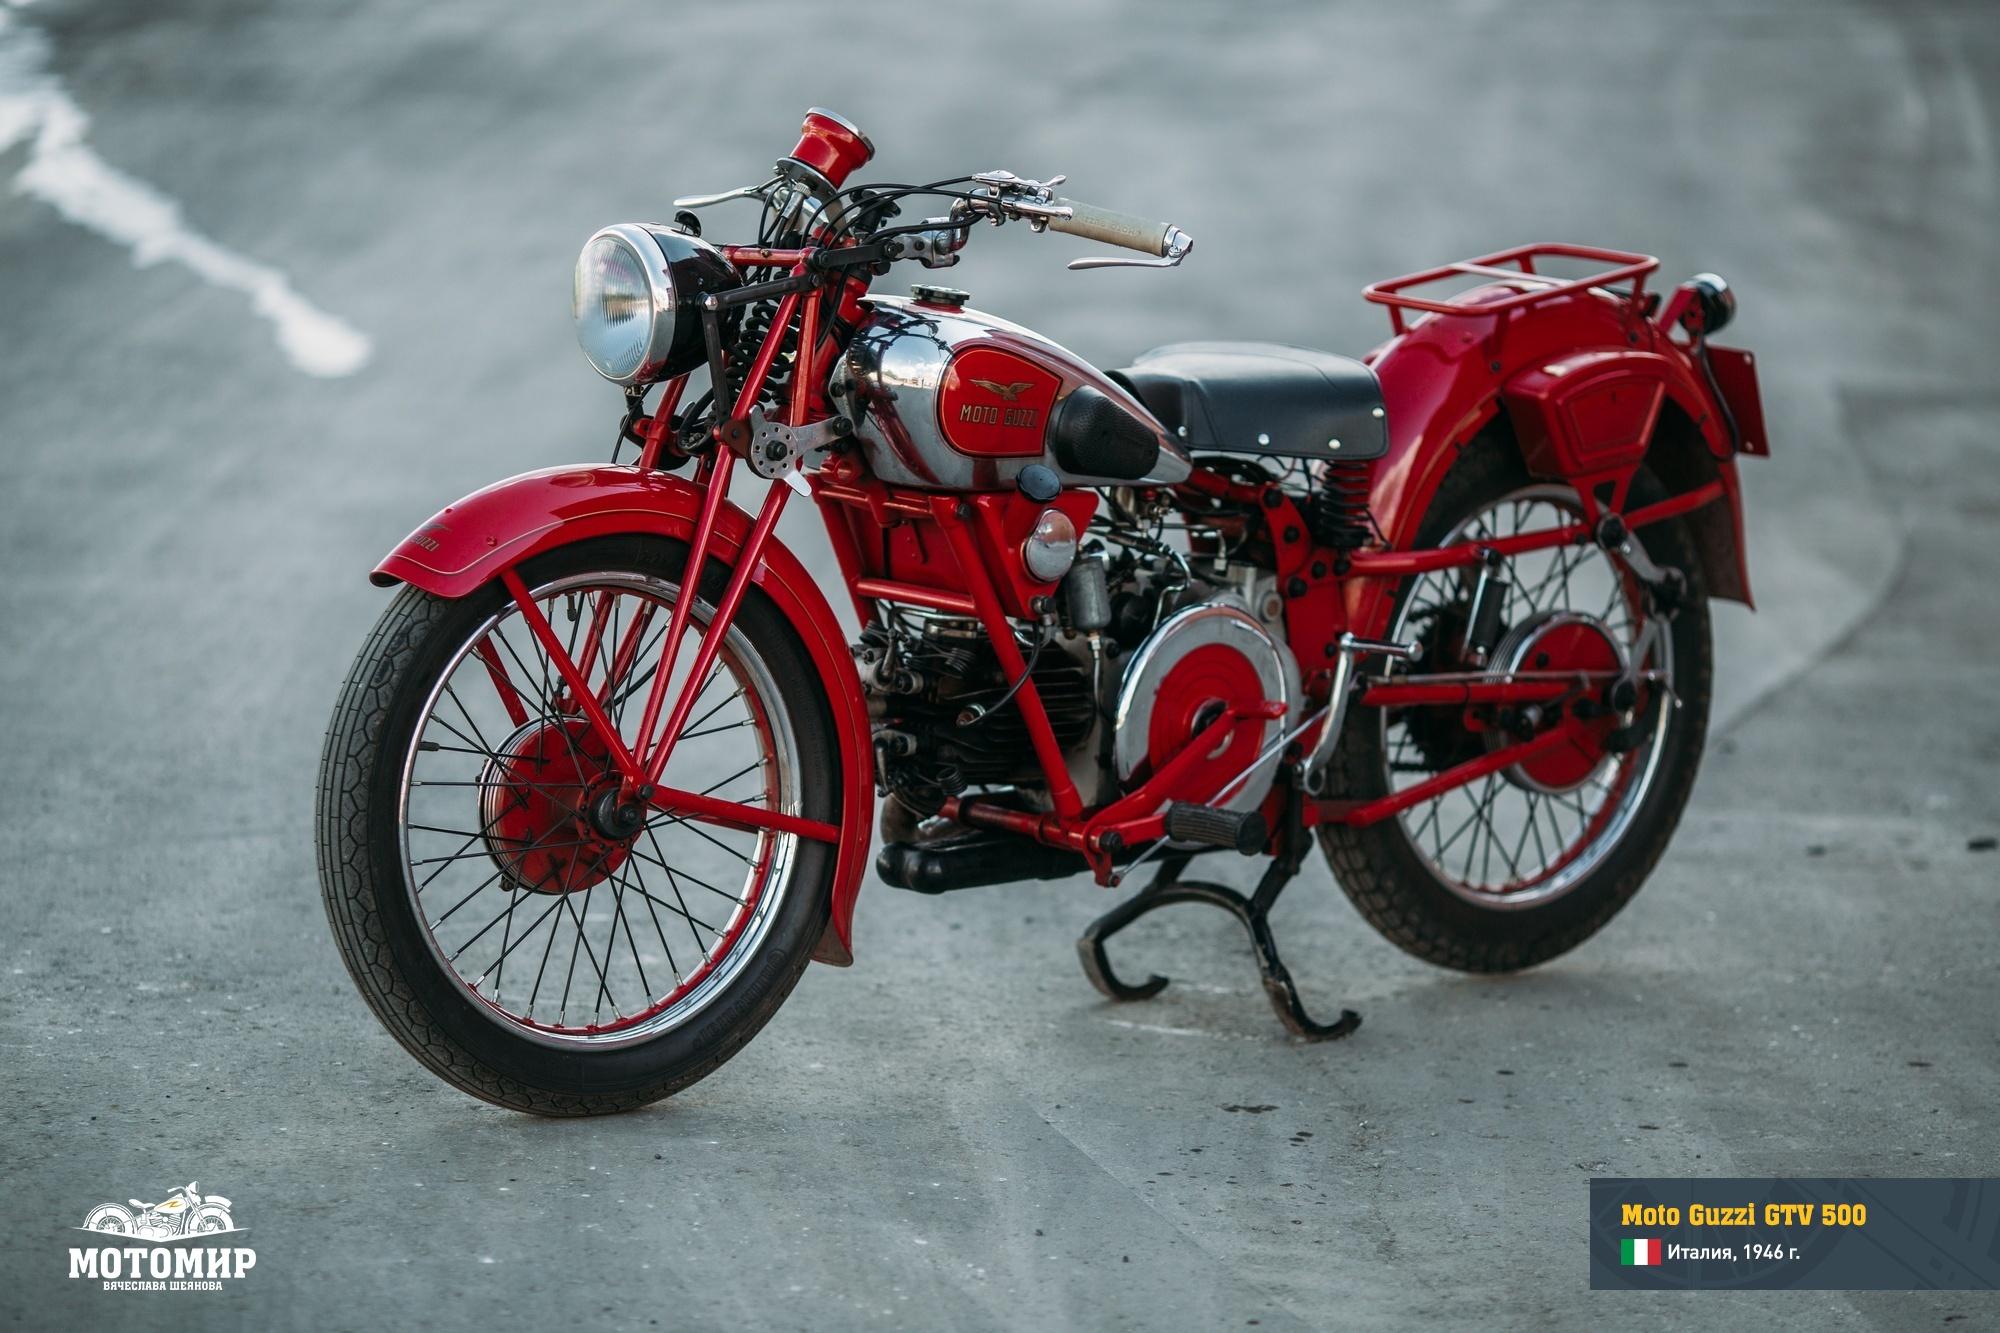 moto-guzzi-gtv-500-201509-web-06